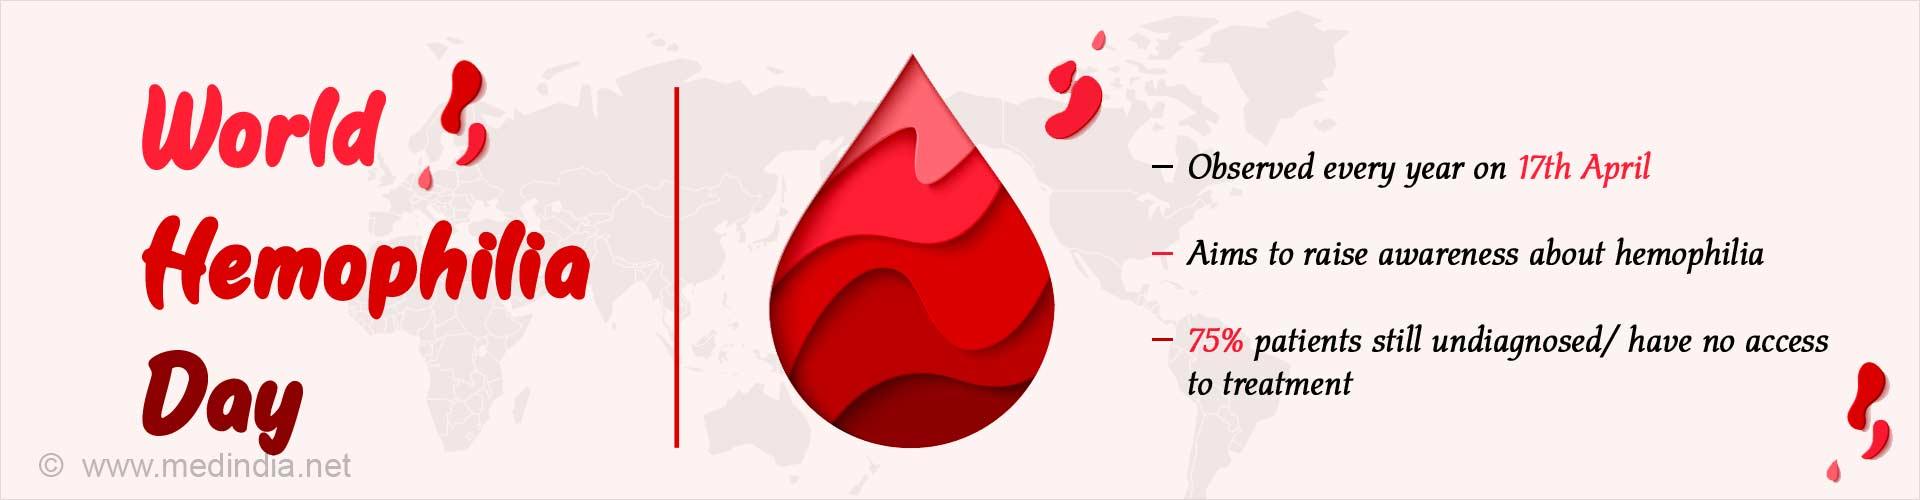 World Hemophilia Day – Reaching Out